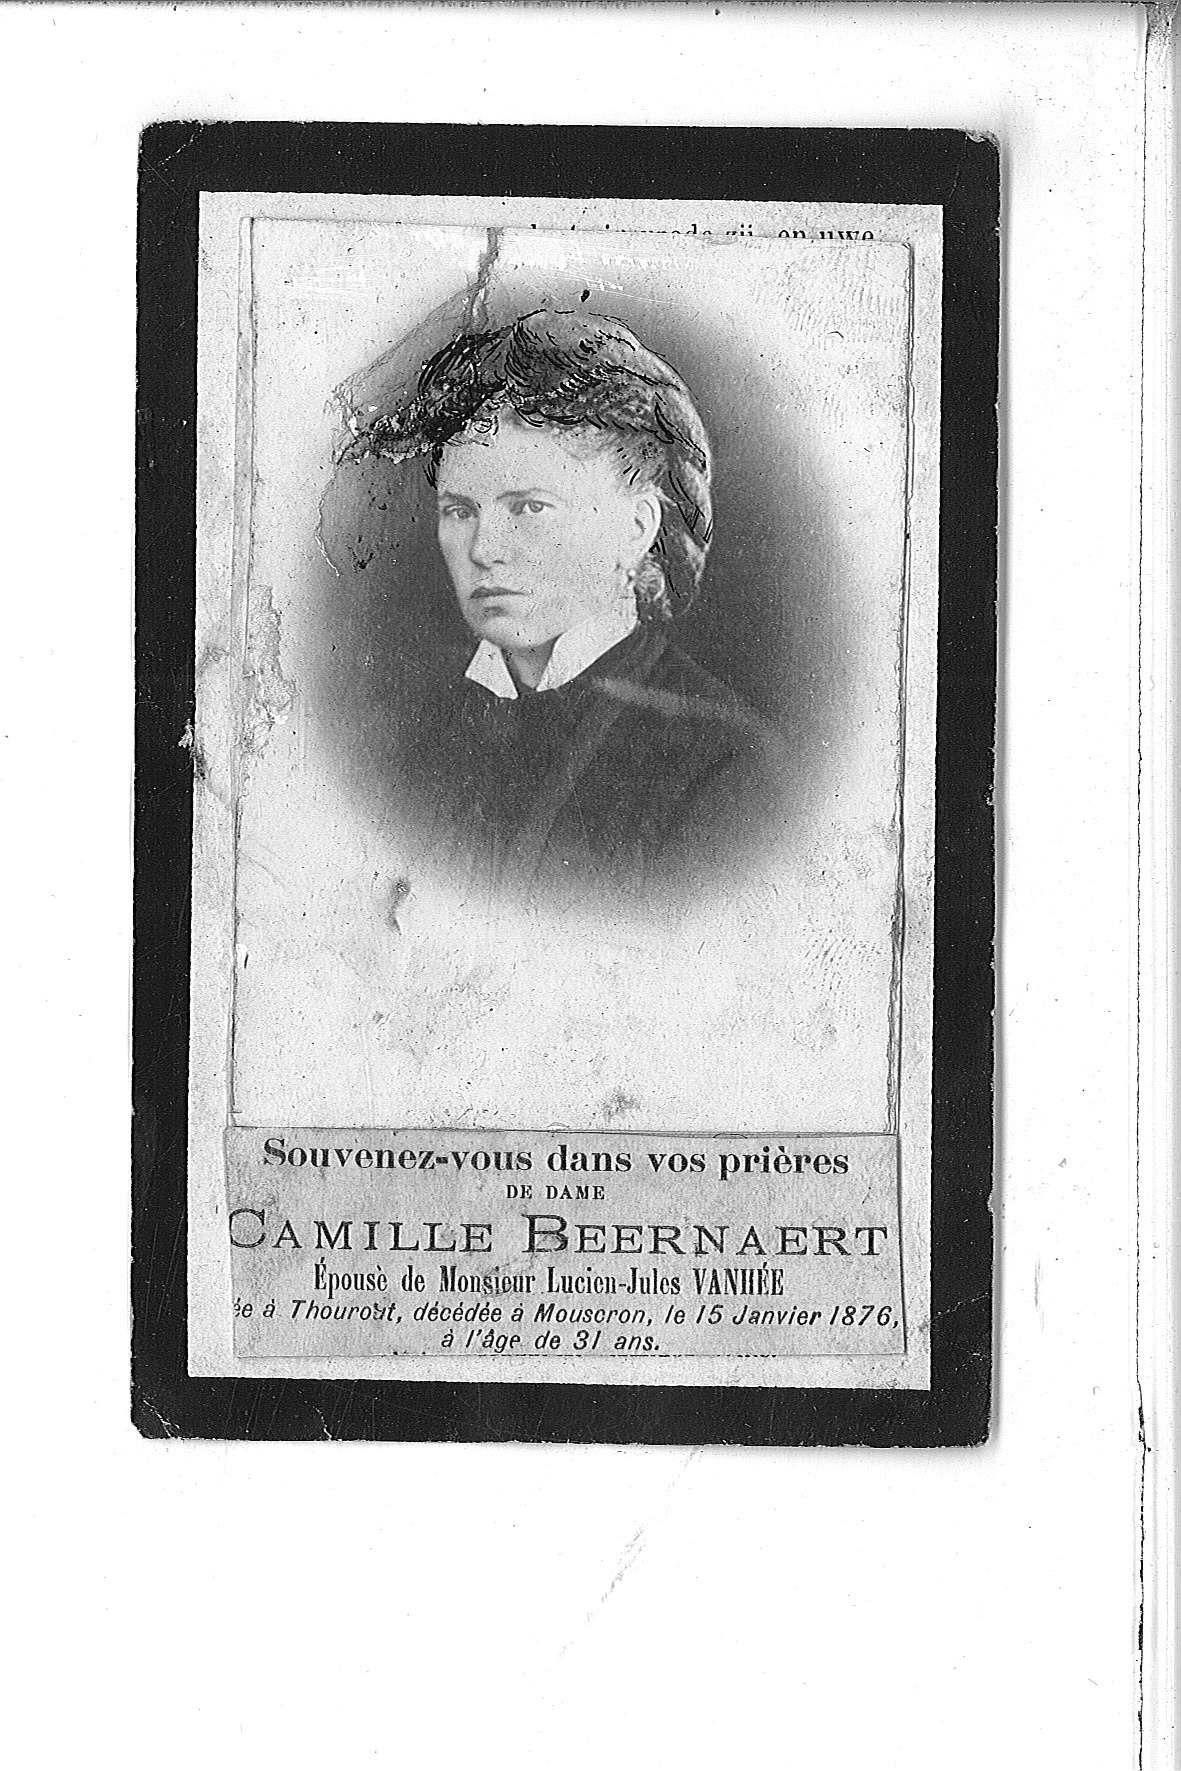 Camille(1876)20101129154314_00022.jpg